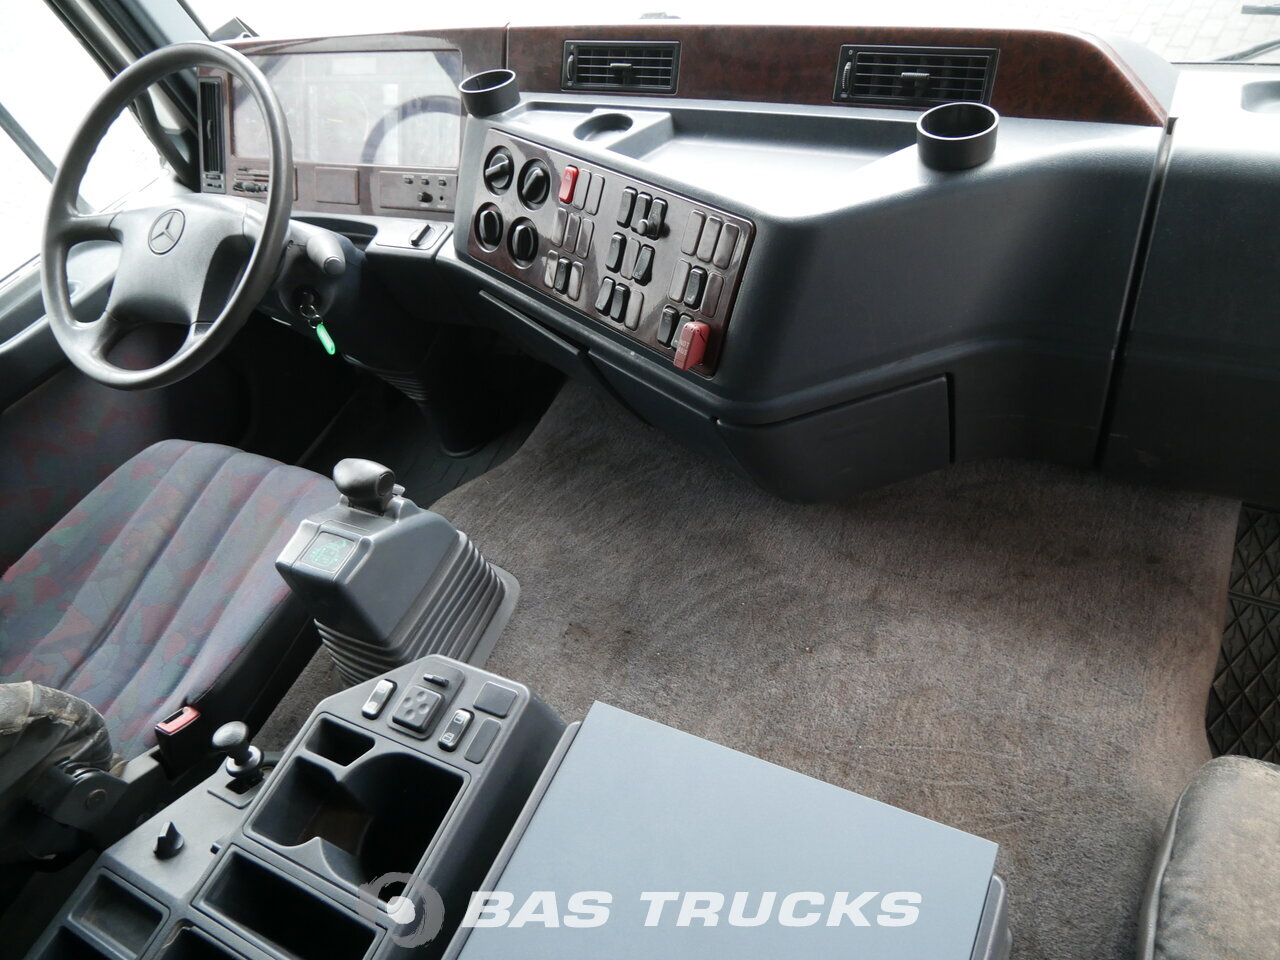 foto de Usado Camiones Mercedes Actros 2543 L 6X2 1999